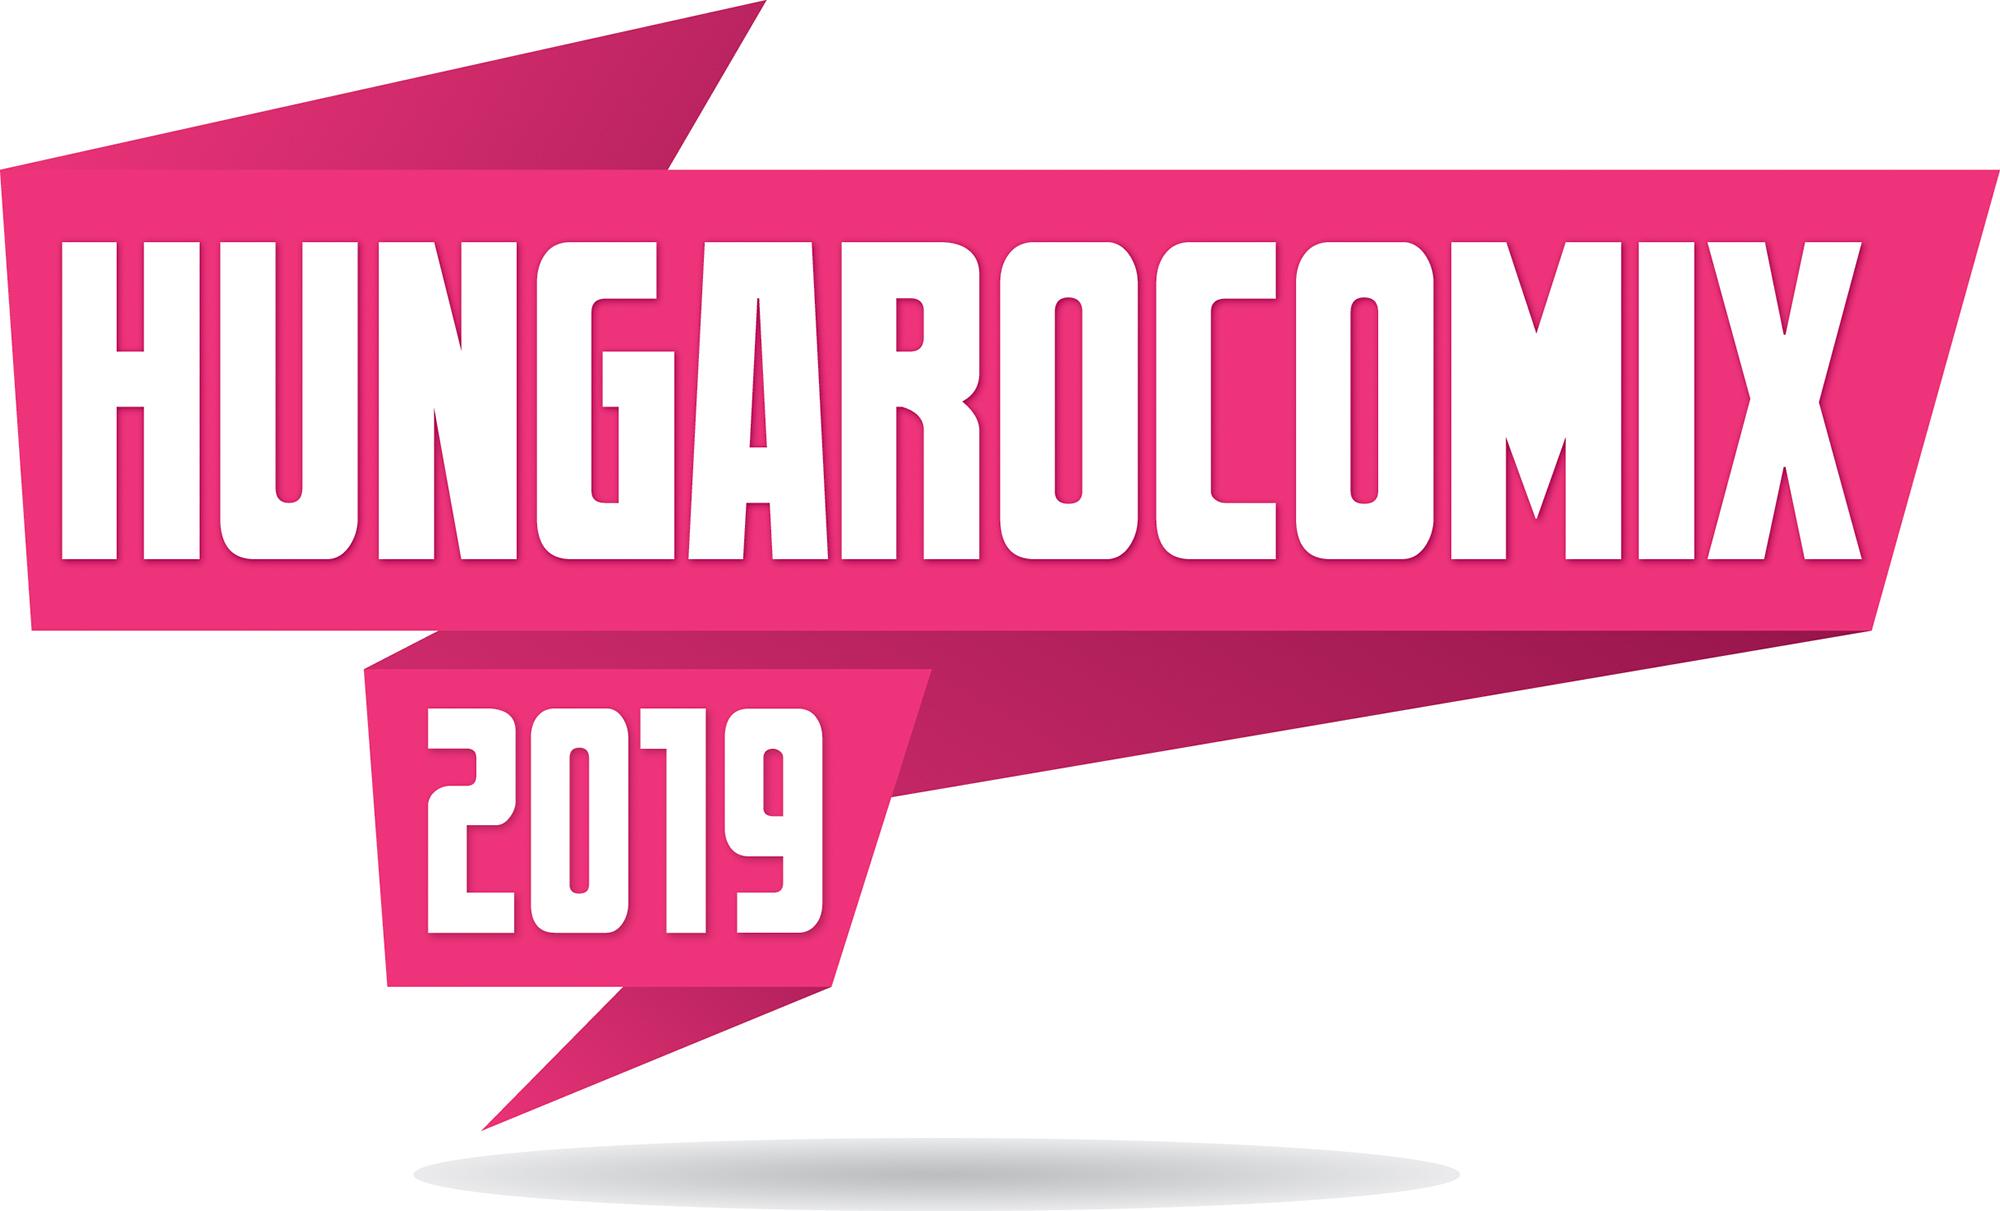 hungarocomix2019_logo.jpg